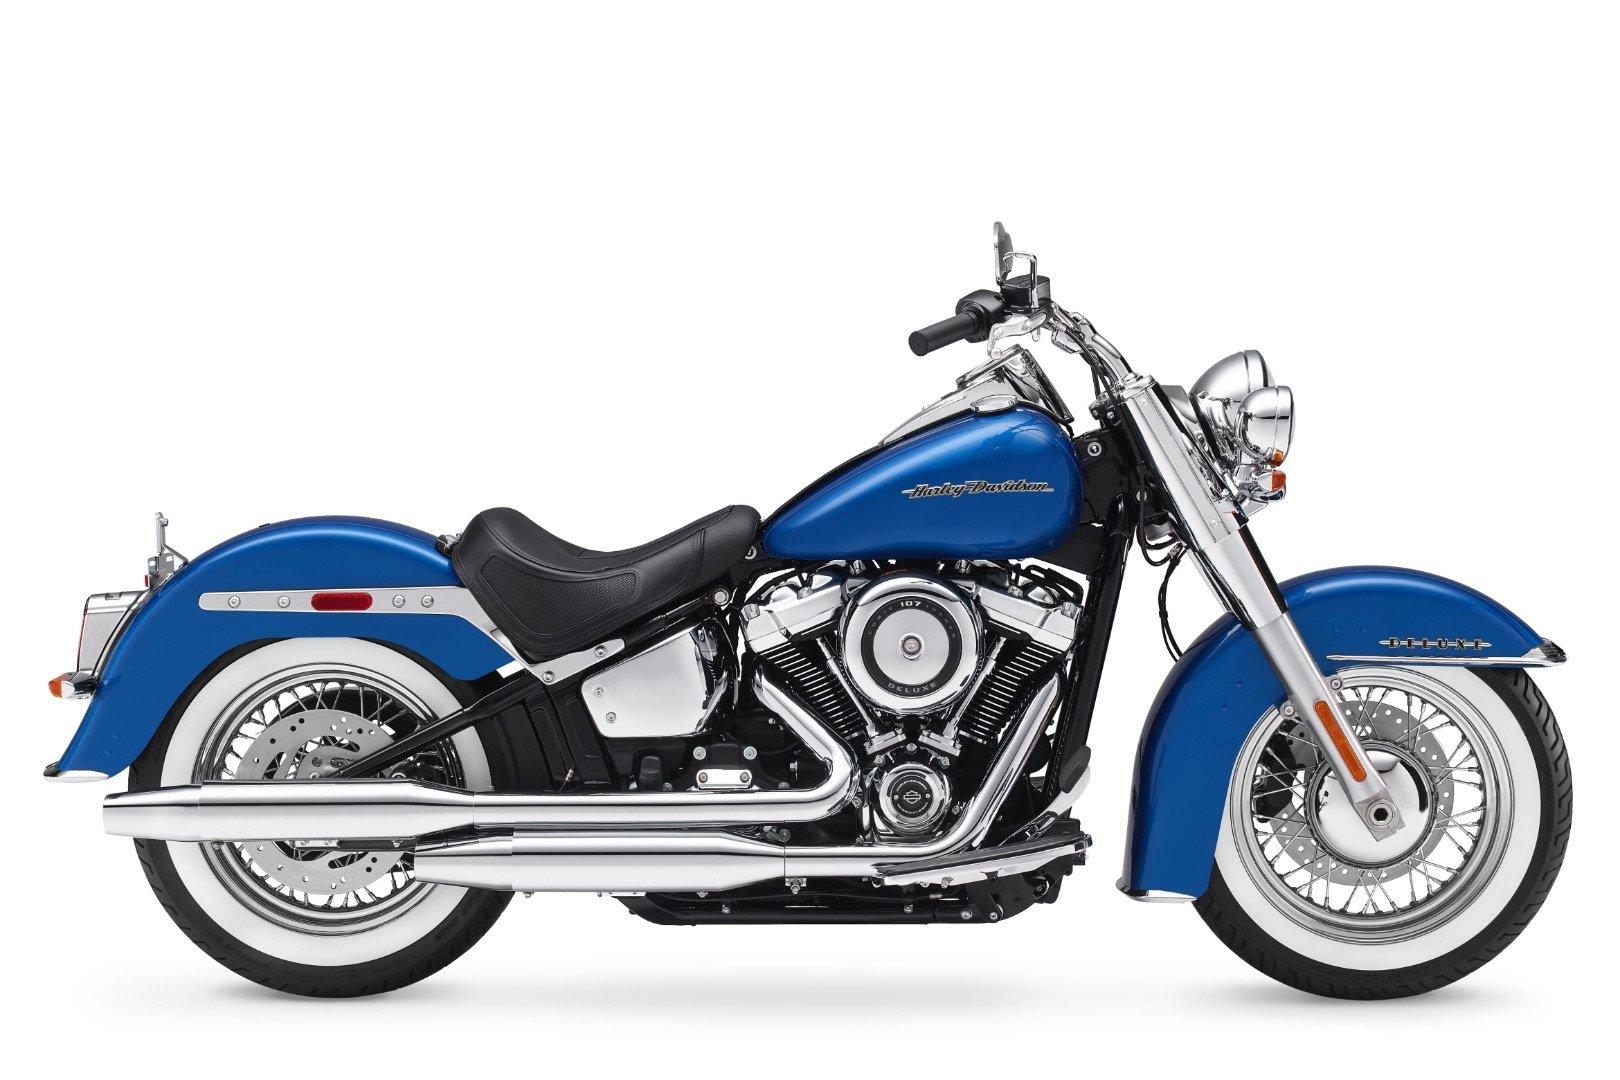 2018 Harley-Davidson Deluxe Buyer's Guide Price